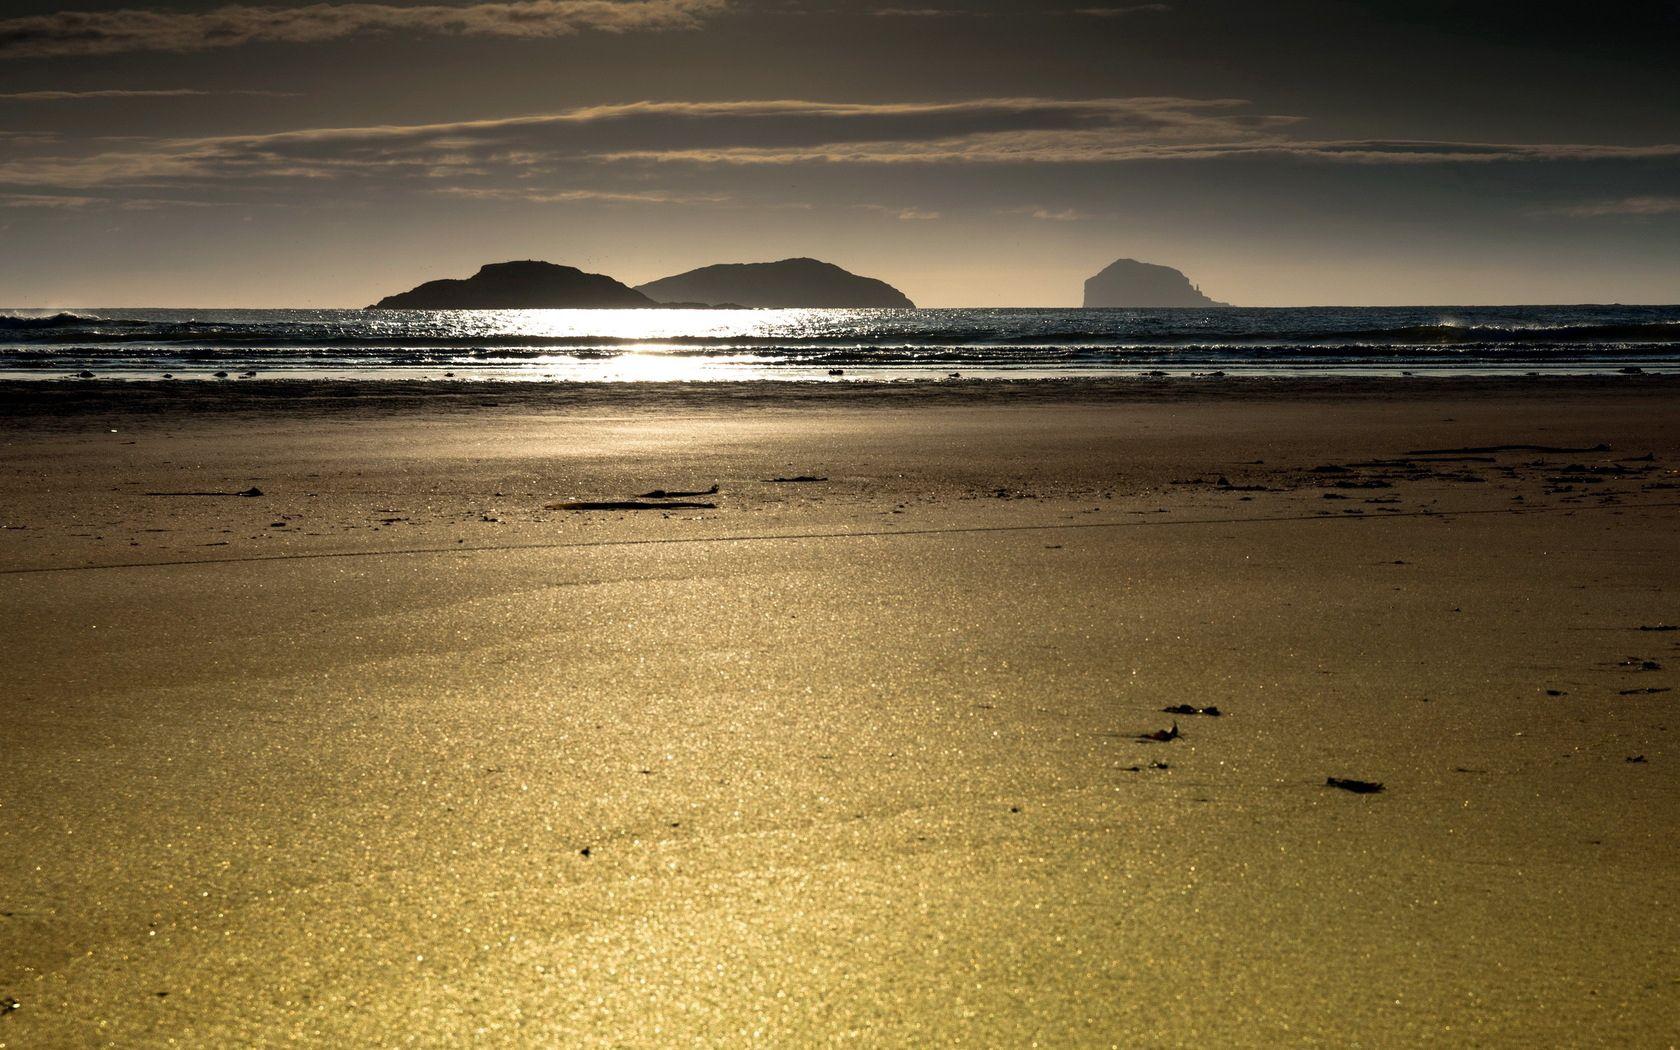 141737 descargar fondo de pantalla Naturaleza, Arena, Playa, Mar, Marea Baja, Bajamar, Paisaje: protectores de pantalla e imágenes gratis